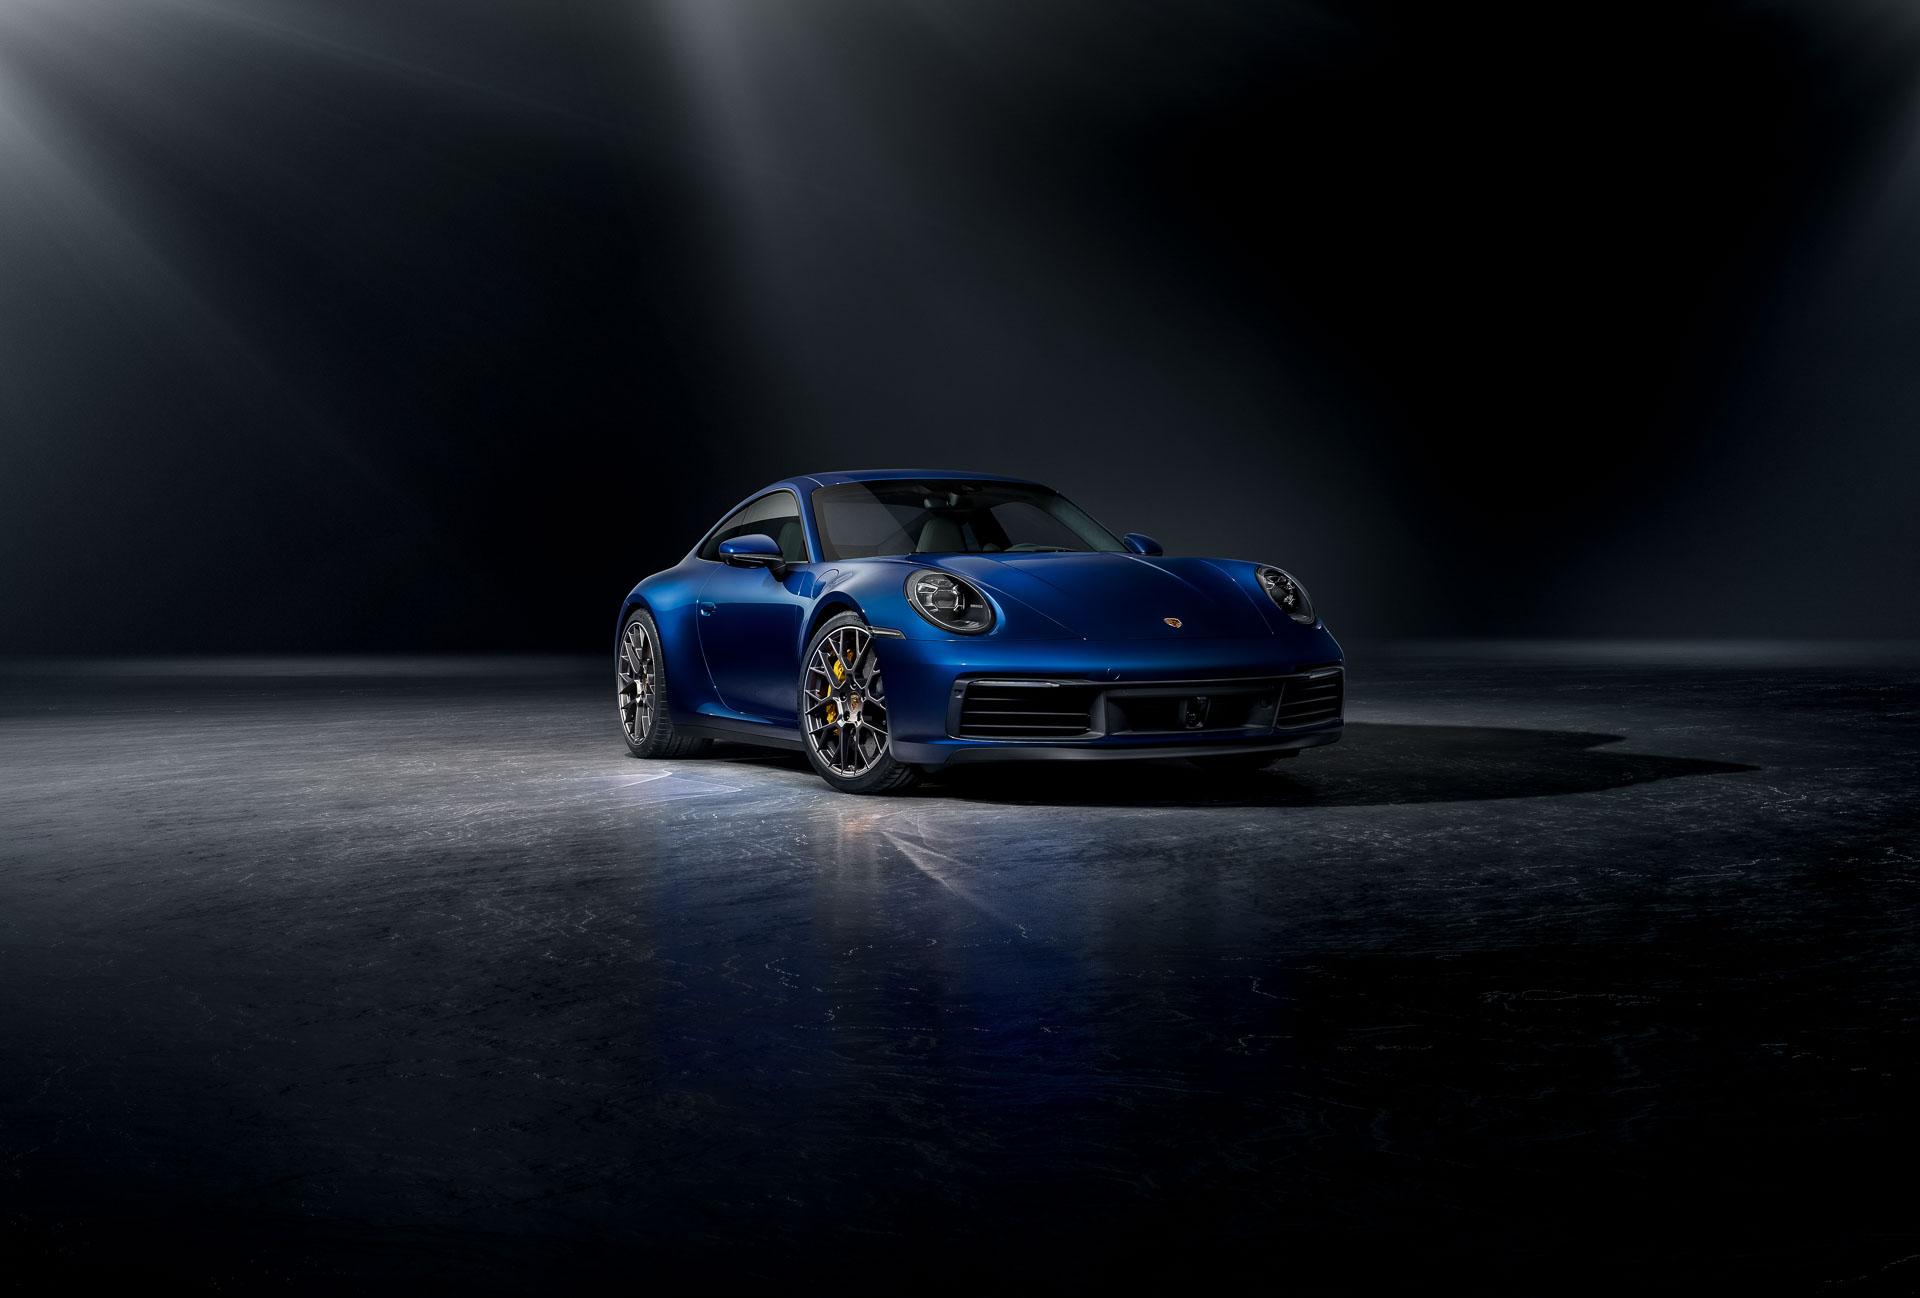 2019 Porsche 911 Carrera 4s - Fanaticar Magazin